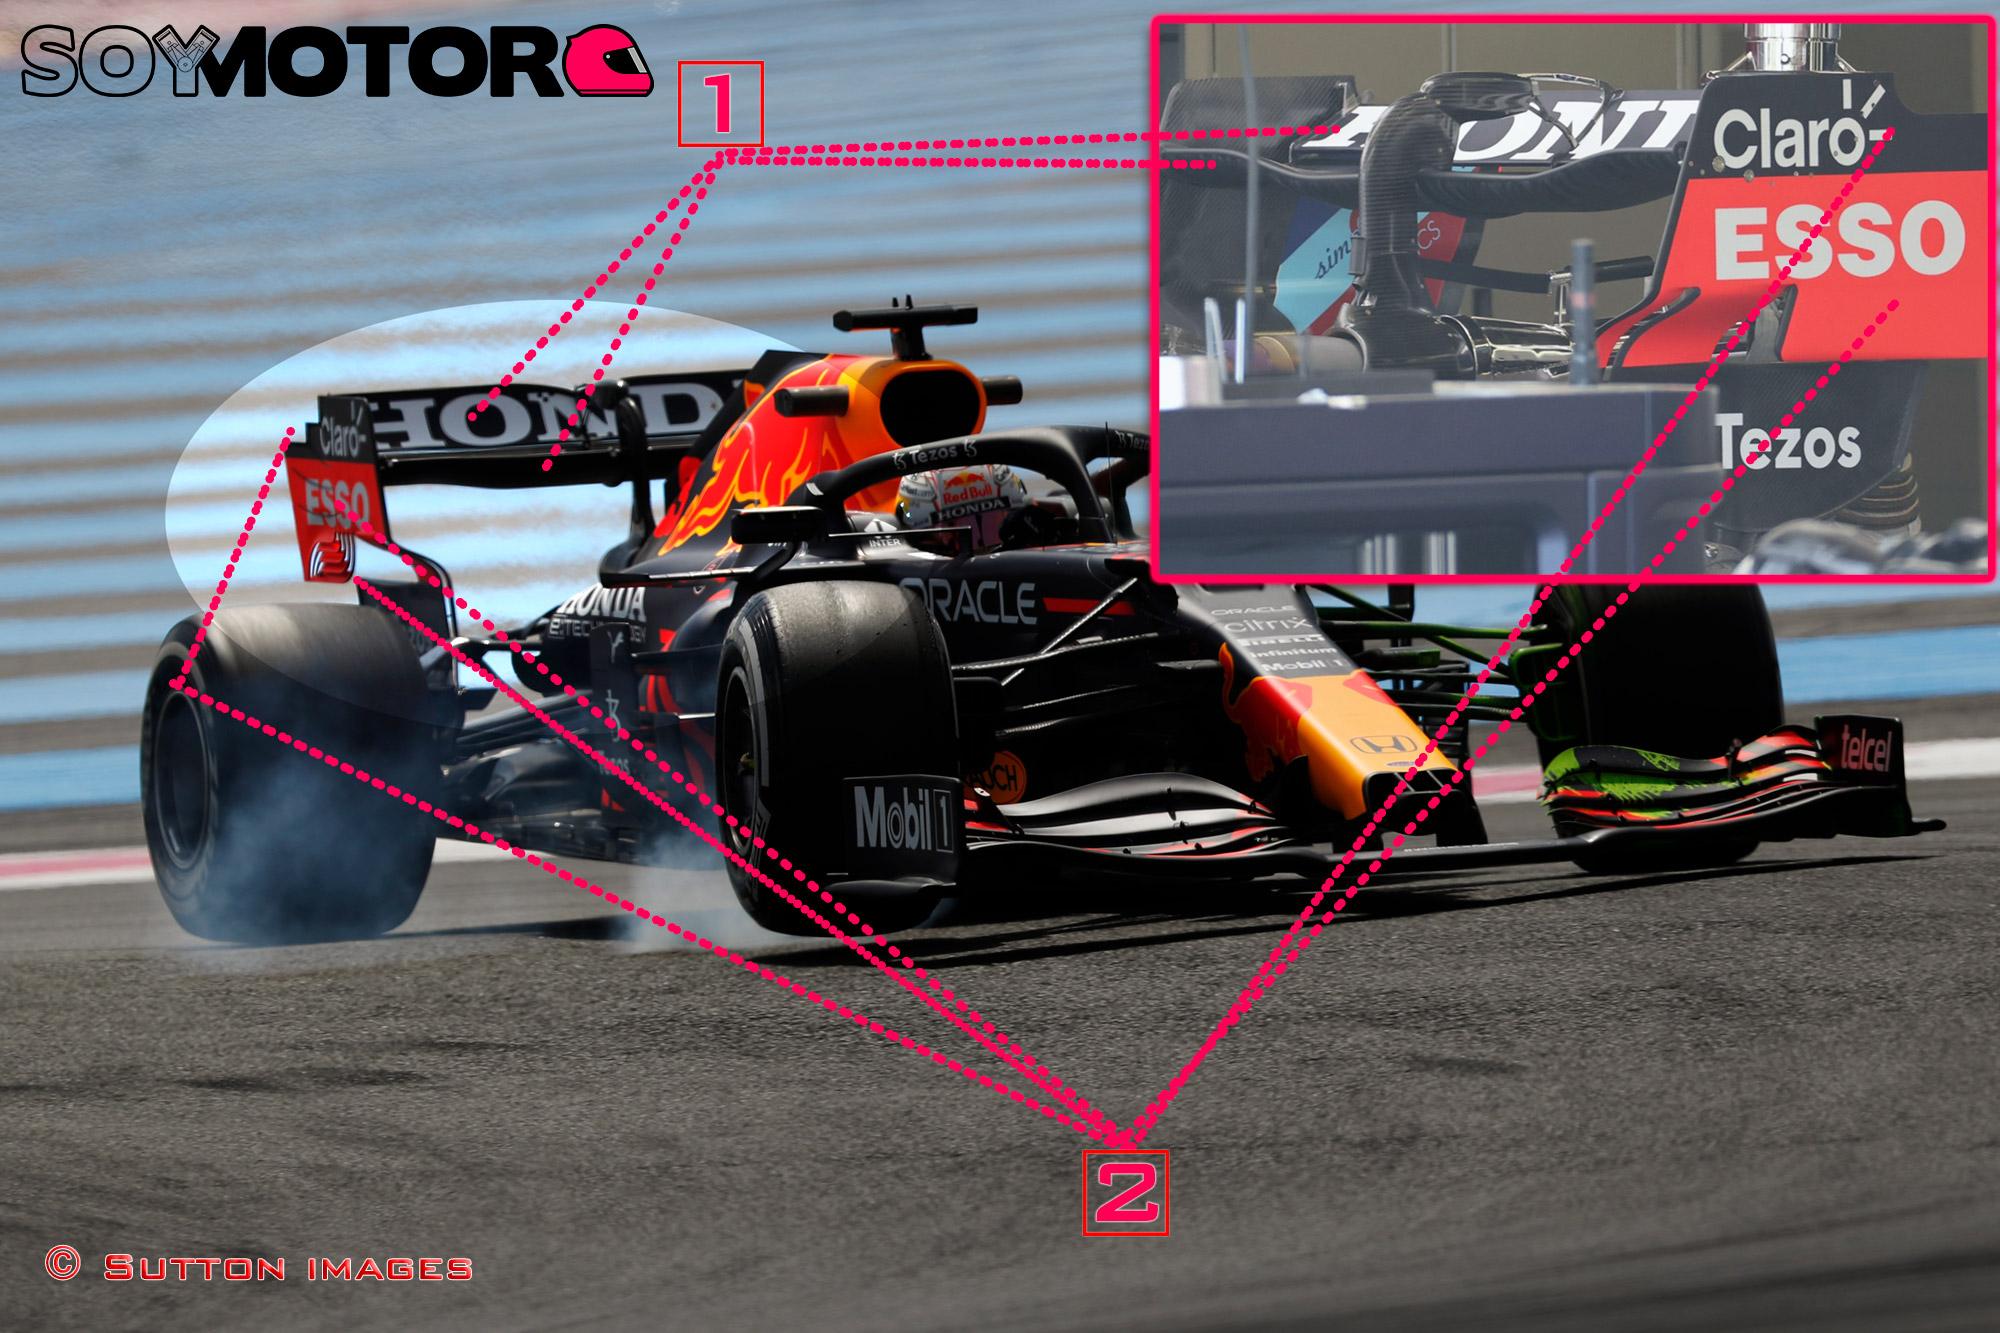 red-bull-ala-trasera-soymotor_4.jpg